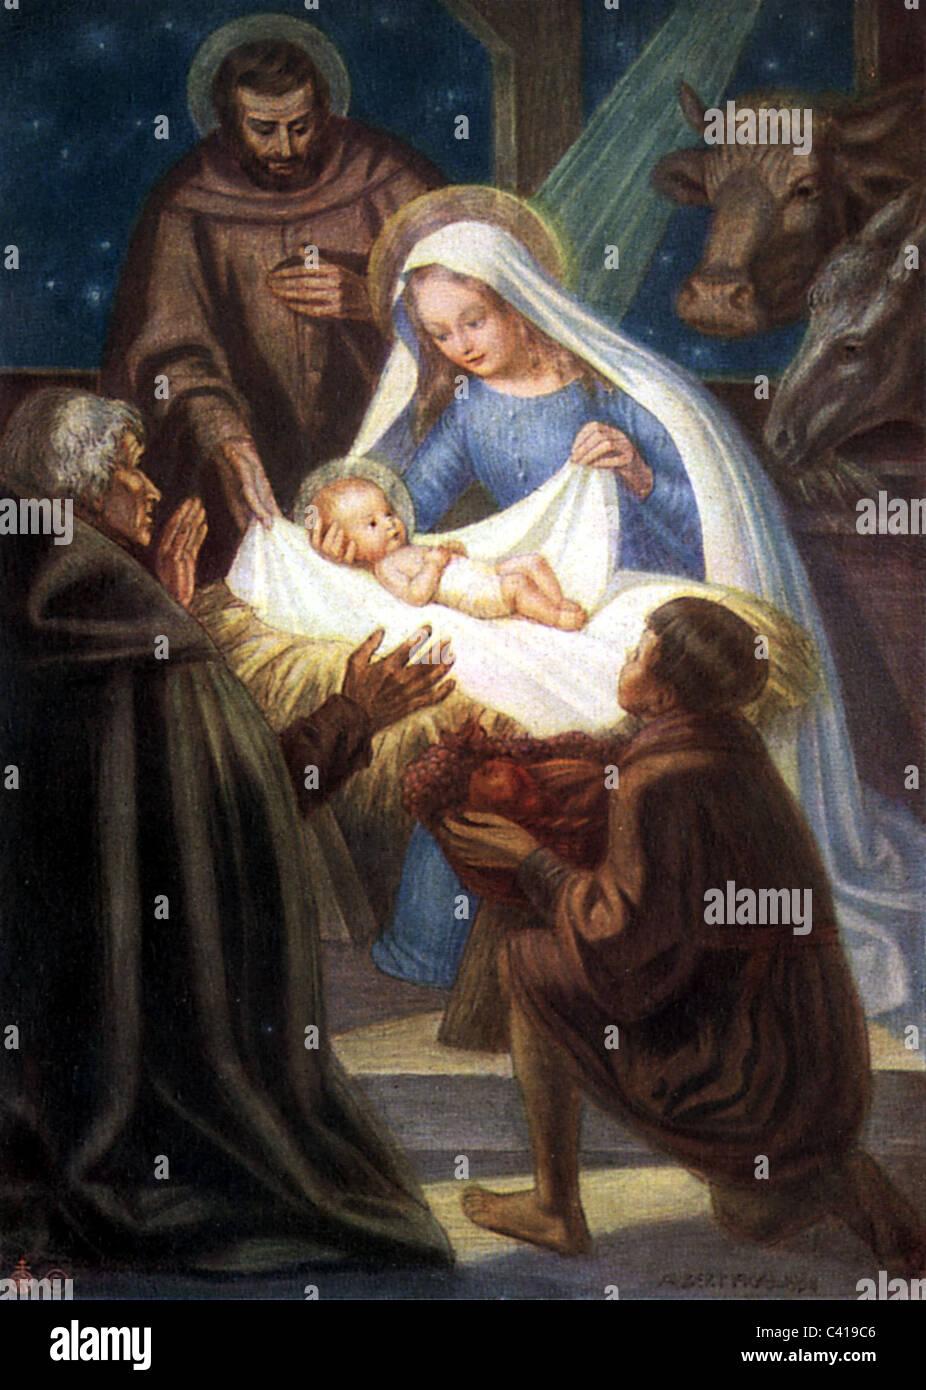 Christmas Nativity Scene Holy Mary Joseph And Baby Jesus In The Stock Photo Alamy